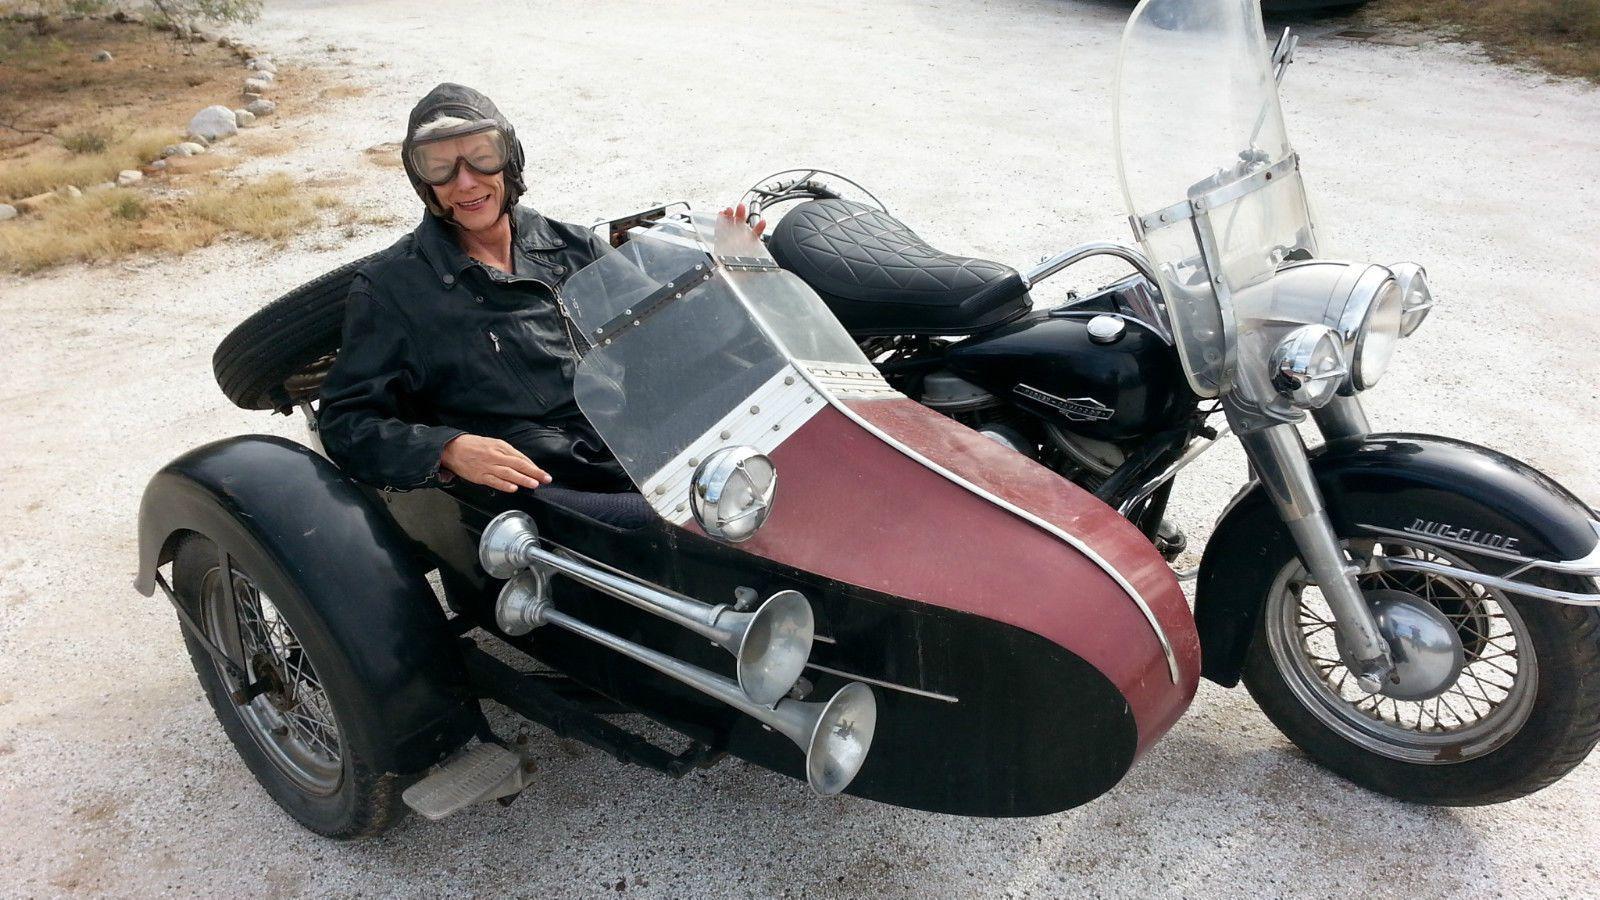 Harley Sidecar For Sale Google Search Harley Davidson Sidecar